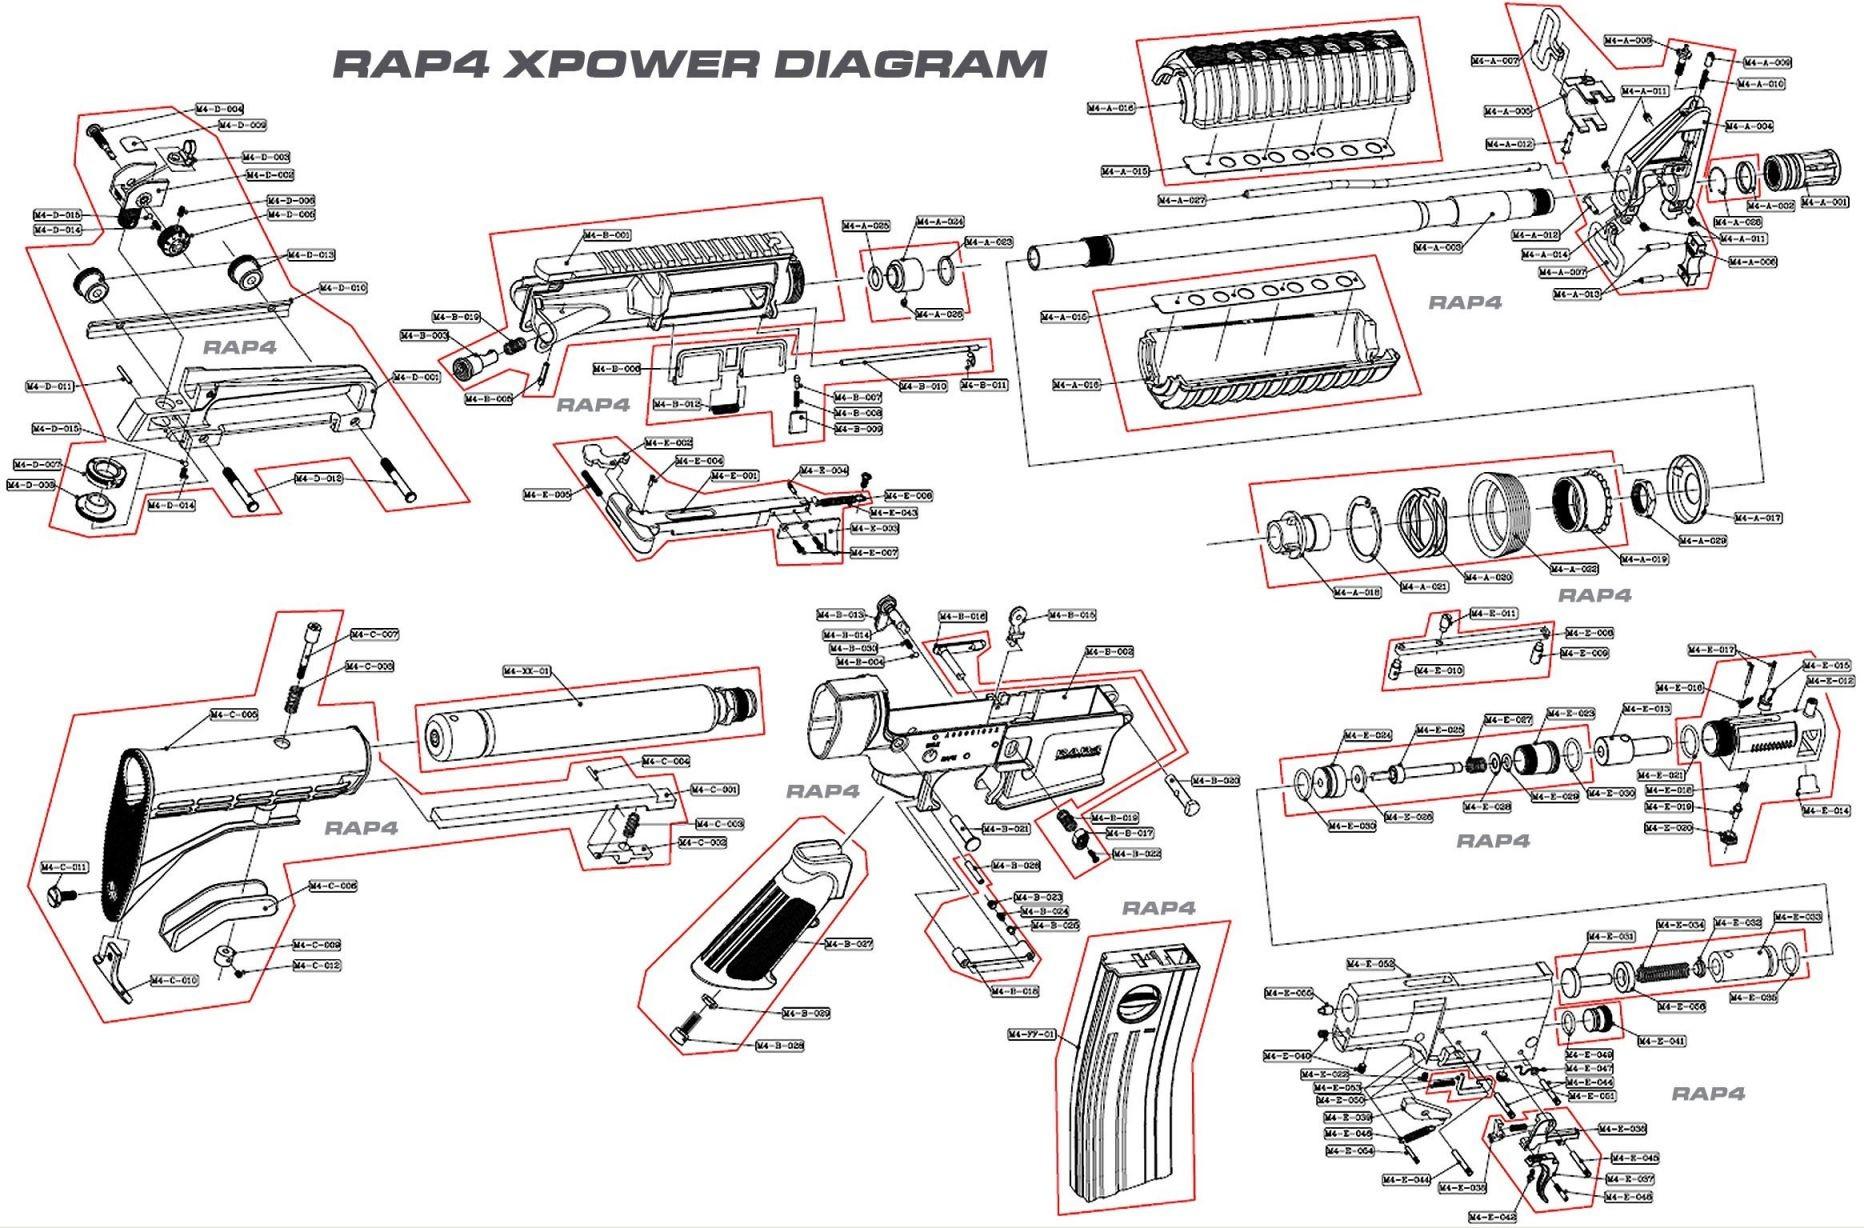 Auto Part Diagram Favorite Car Body Diagram Uh25 – Documentaries for Change Of Auto Part Diagram